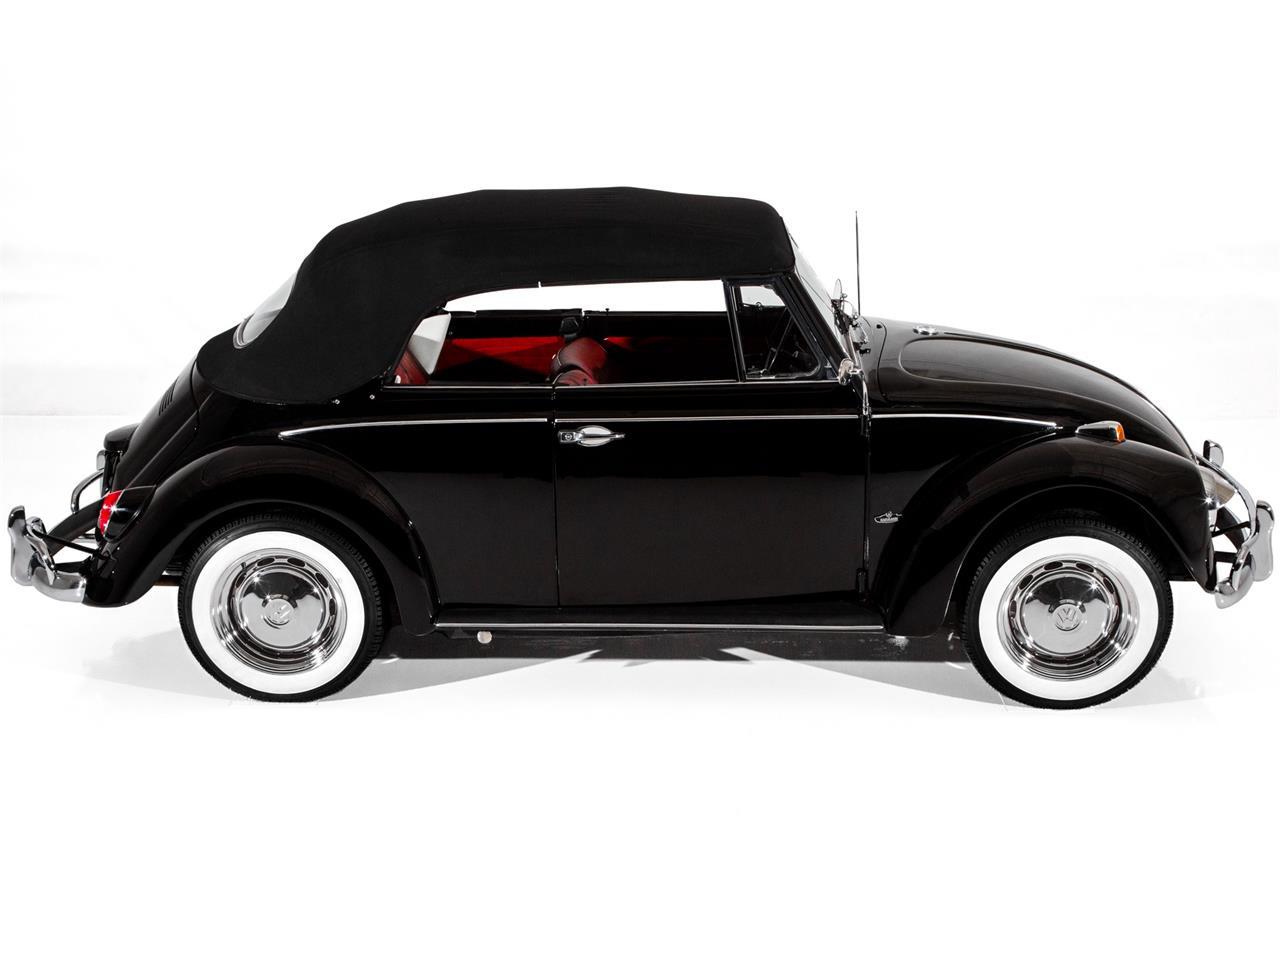 1967 Volkswagen Beetle (CC-1355577) for sale in Des Moines, Iowa